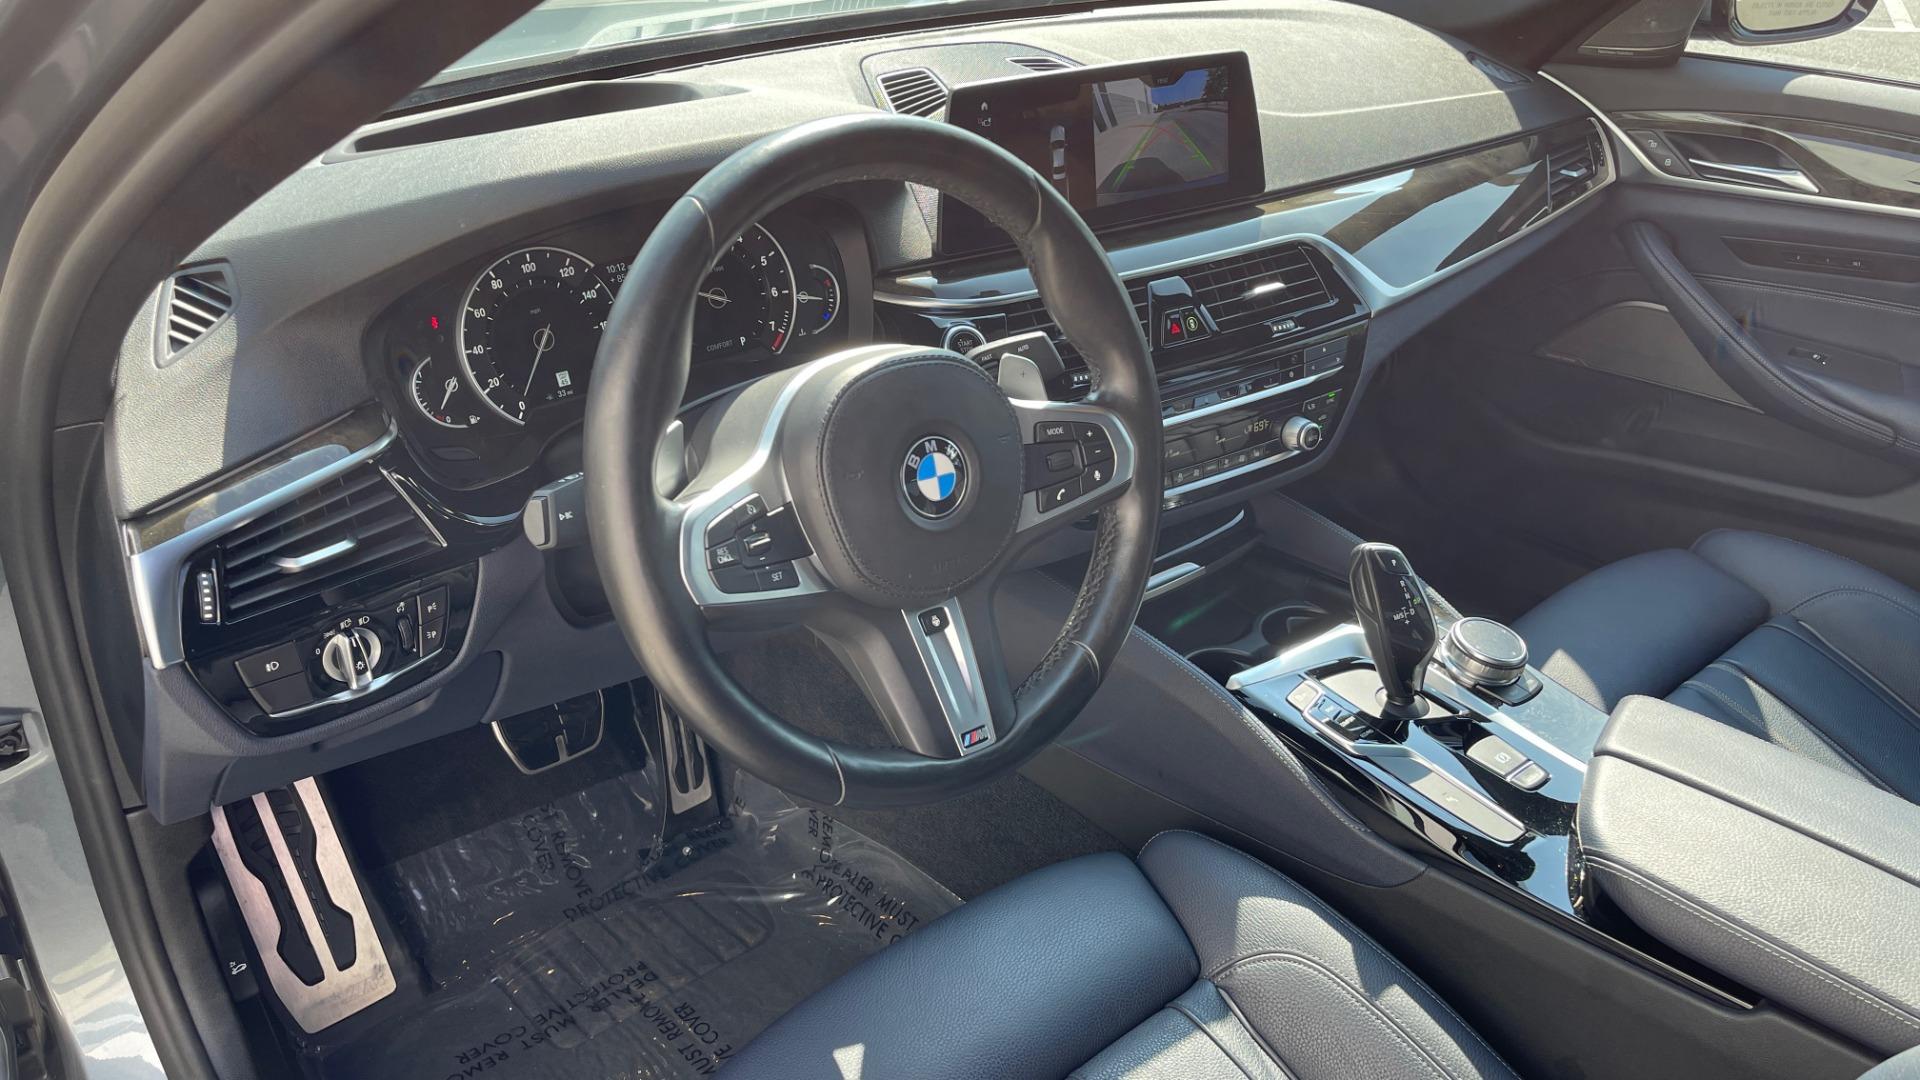 Used 2018 BMW 5 SERIES 540I XDRIVE M-SPORT / DRVR ASST / PDC / APPLE / HUD / H/K SND for sale $42,795 at Formula Imports in Charlotte NC 28227 34